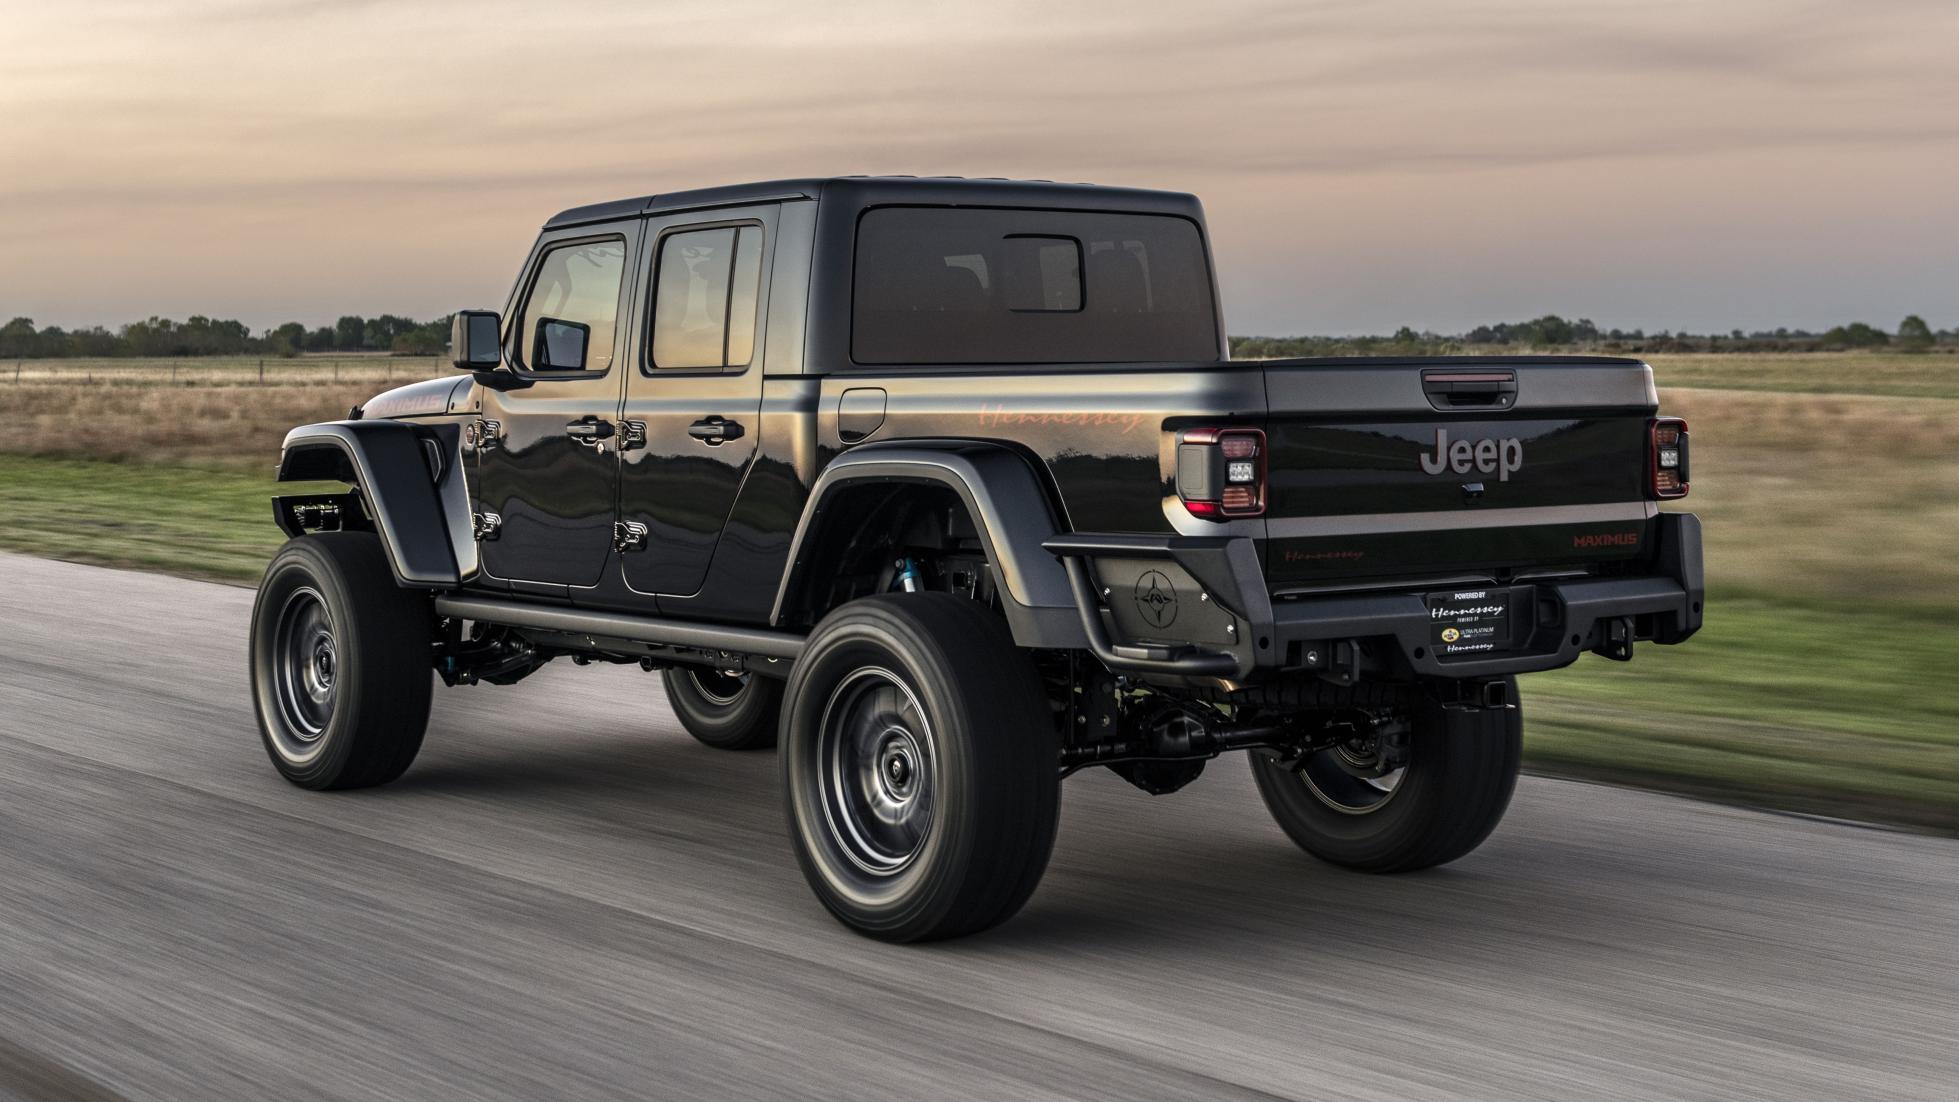 Hennessey a fabriqué un Jeep Gladiator «Maximus» de 1000 ch - Galerie